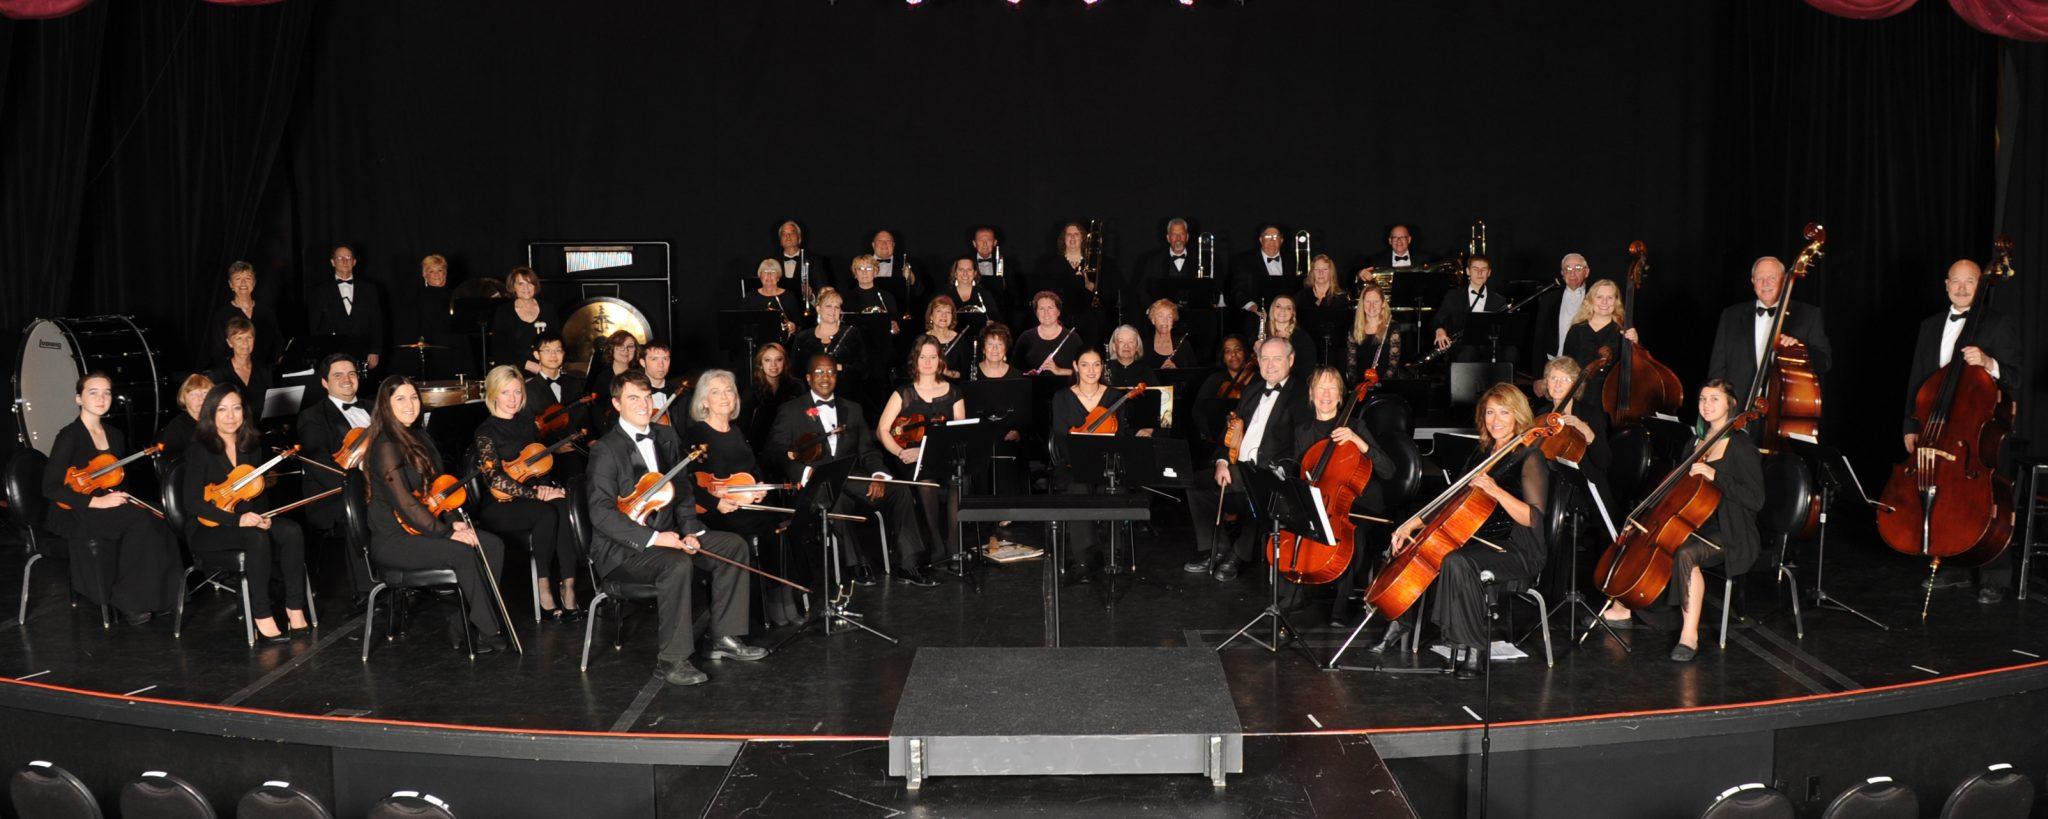 Southern Nevada Symphony Orchestra Concert Honoring Leonard Bernstein